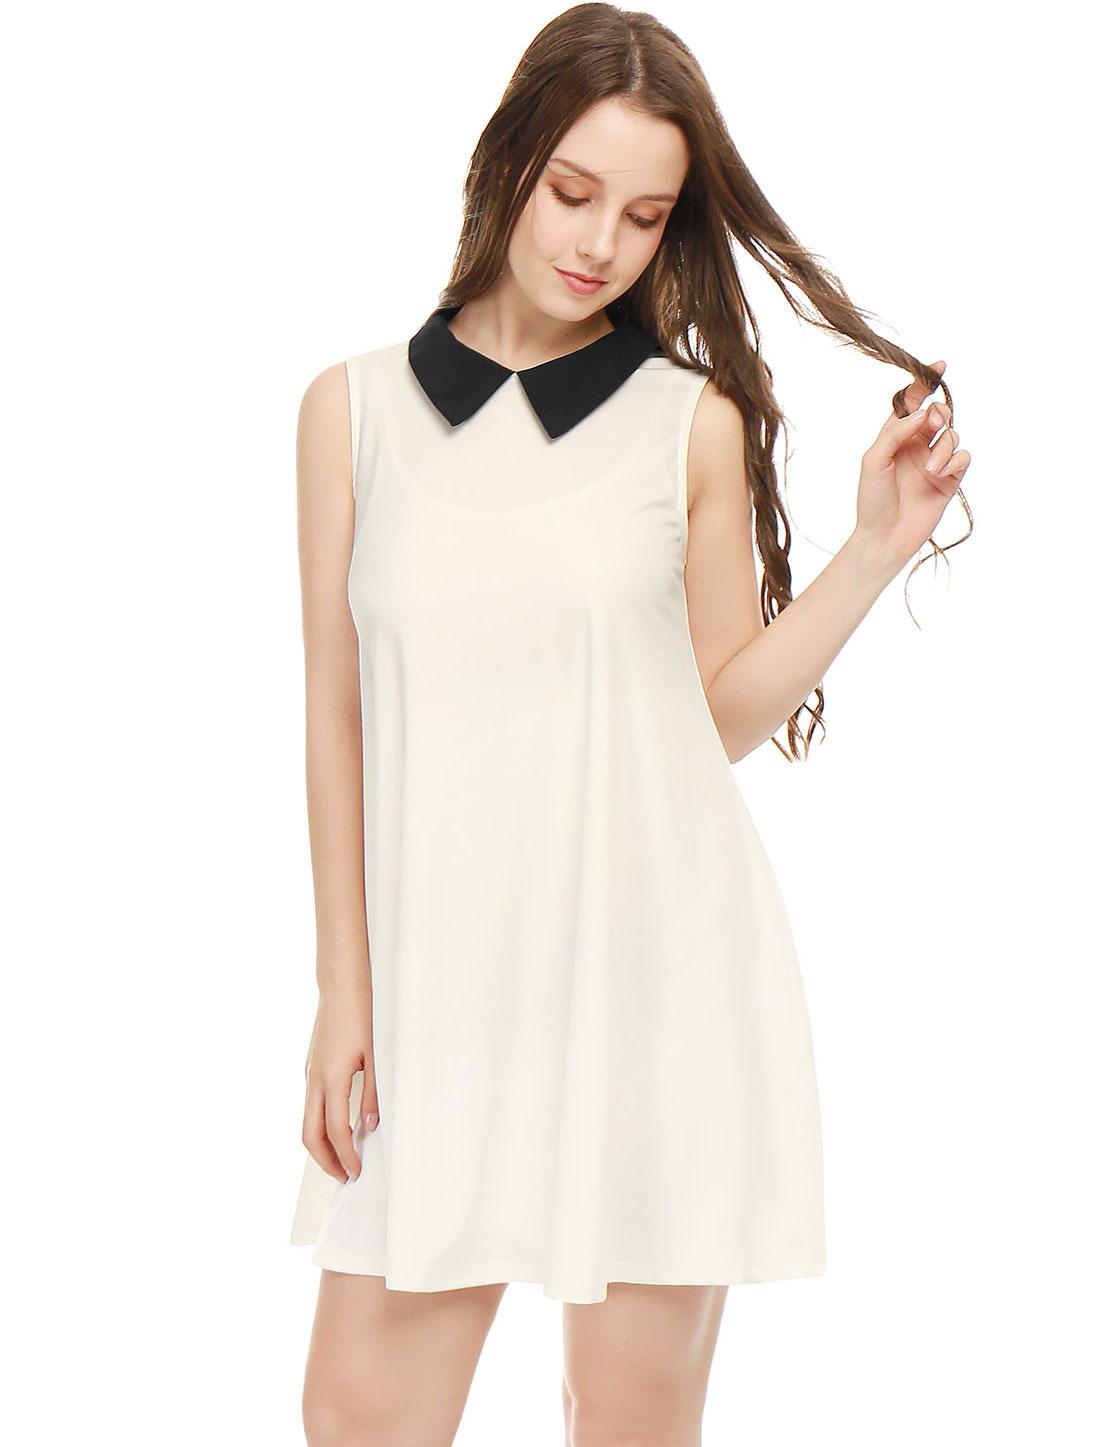 Women Contrast Color Peter Pan Collar Sleeveless Swing Dress White S